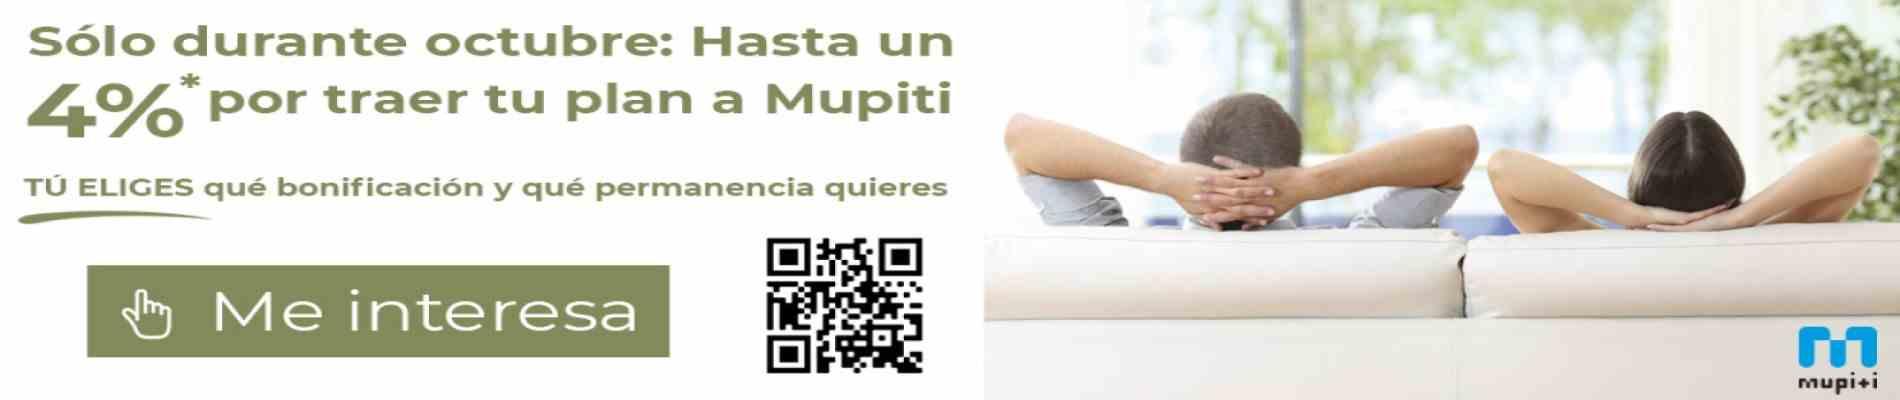 MUPITI Tranquilidad 2021